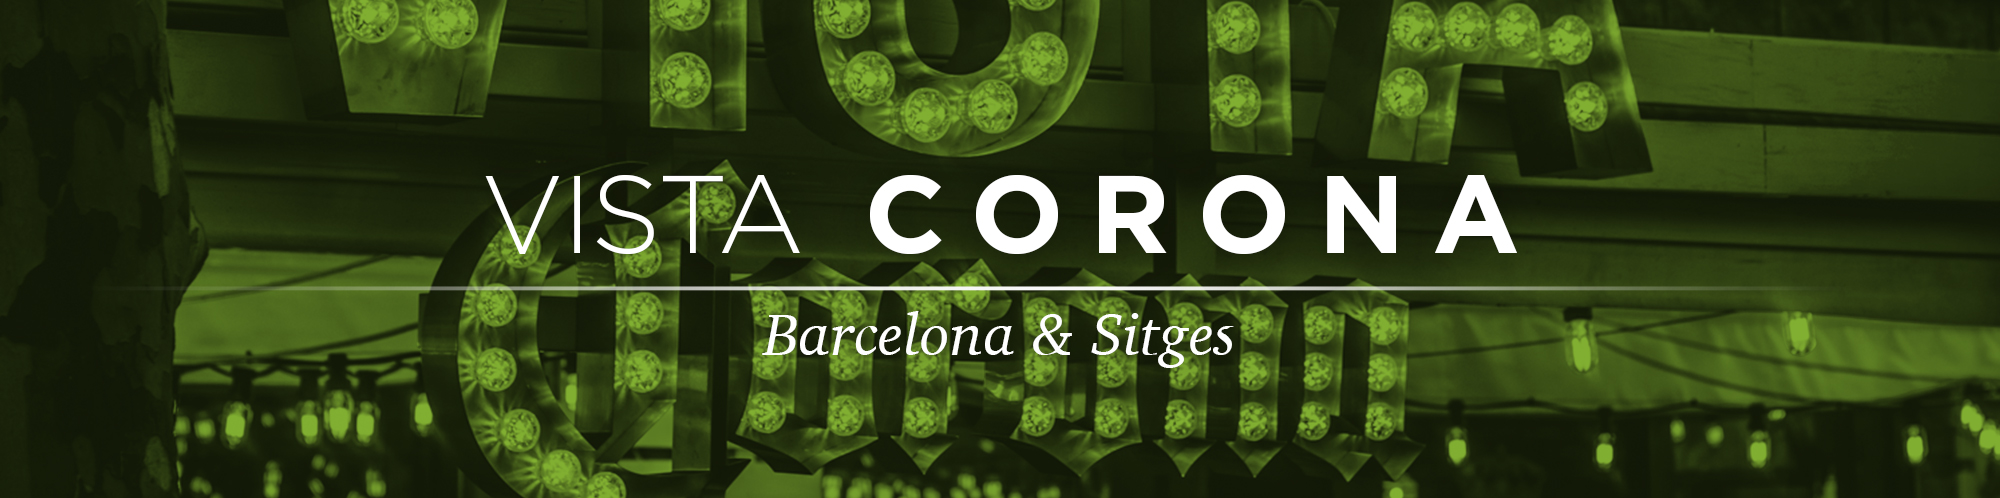 corona-header.jpg